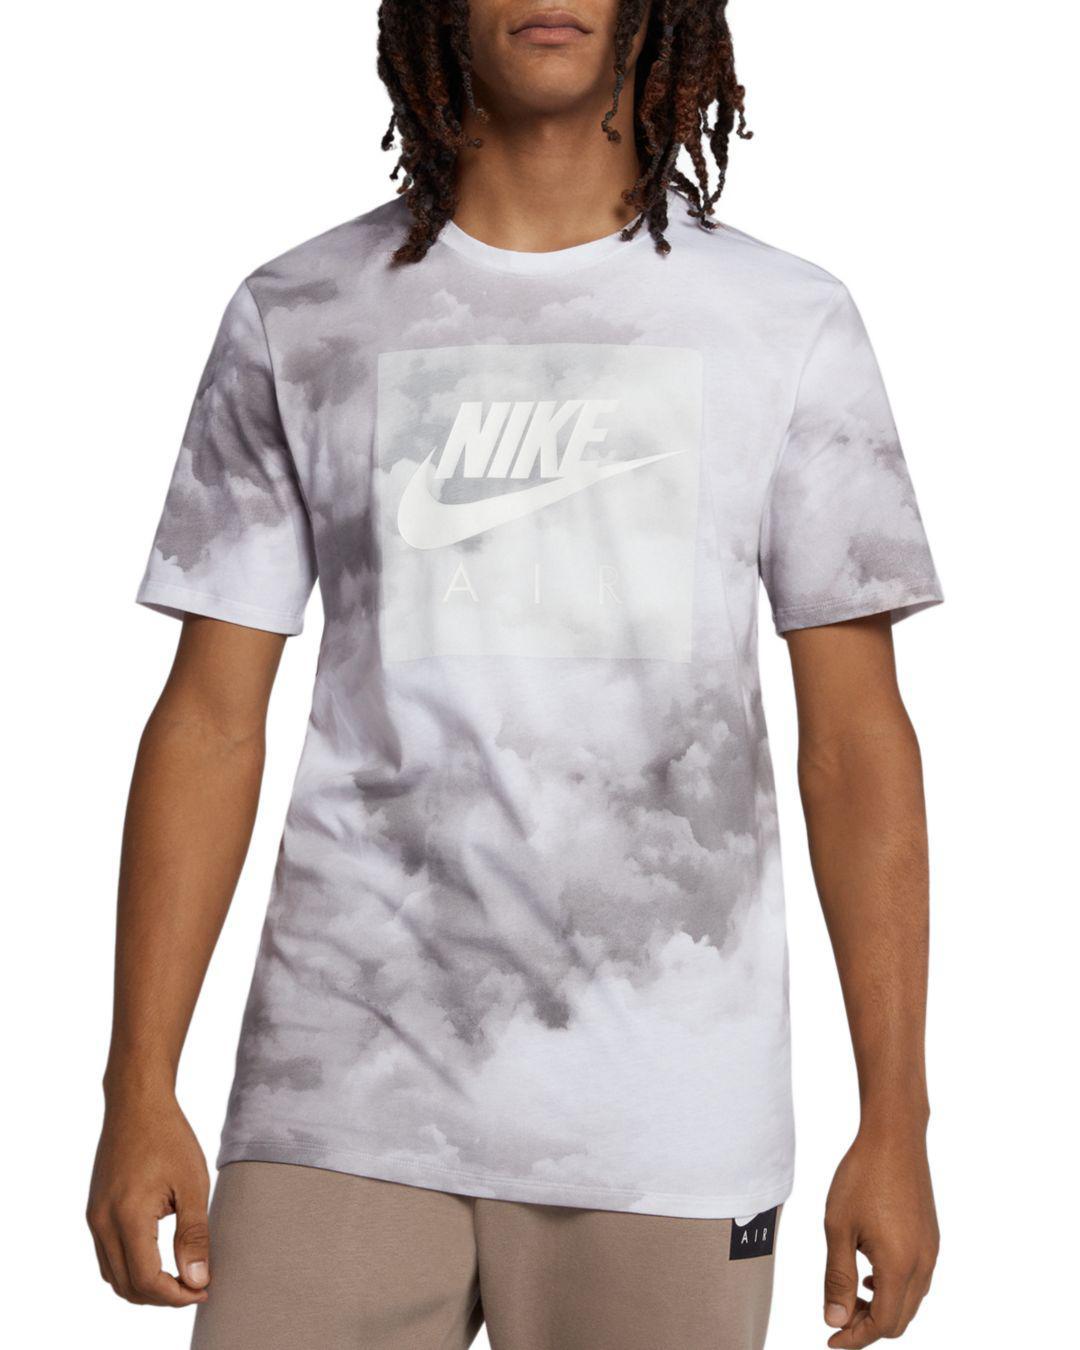 d38dafda3540 Lyst - Nike Cloud-print Air Logo Graphic Tee in White for Men